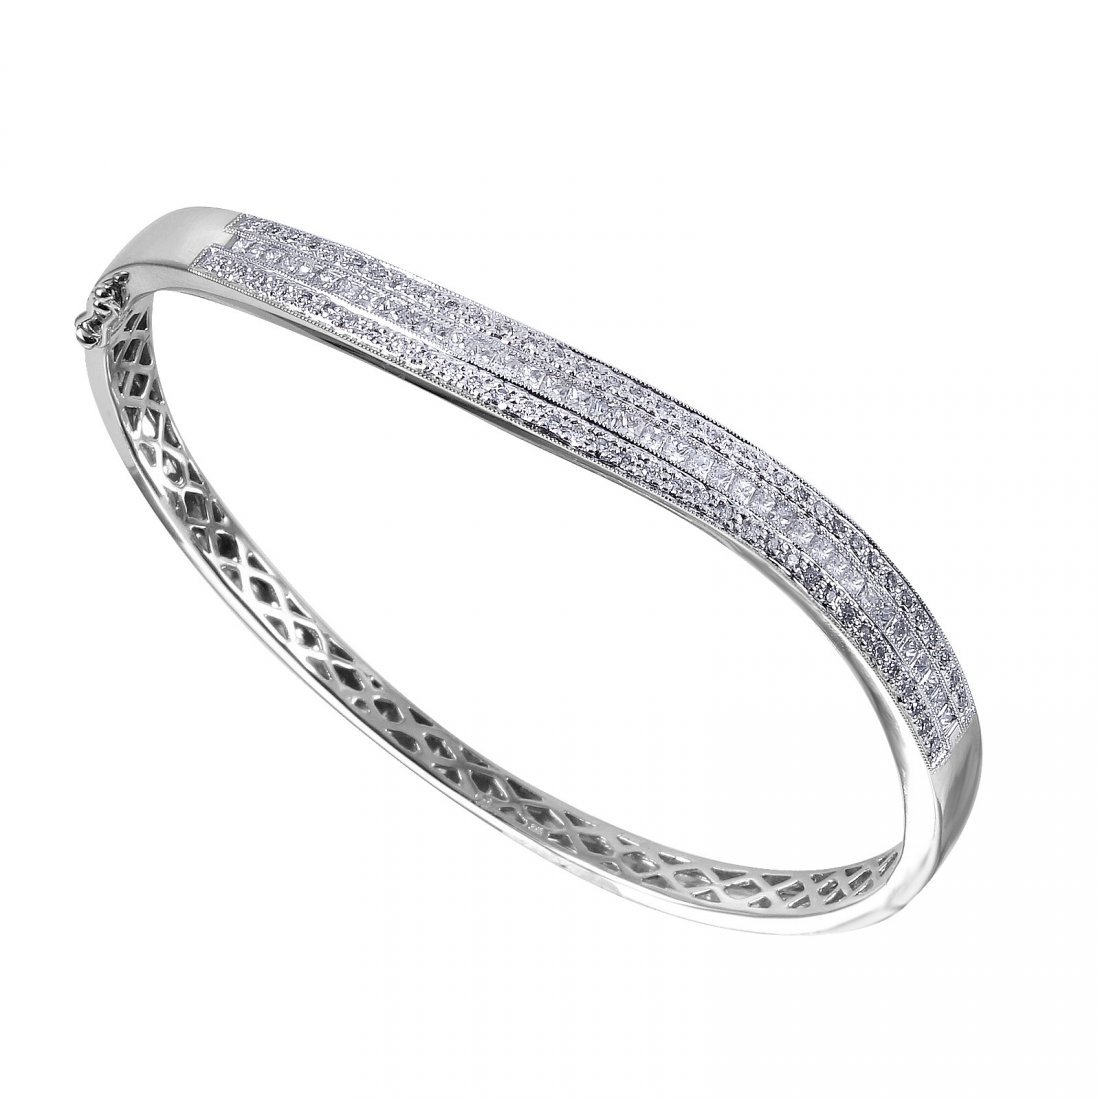 14KT White Gold Diamond Bangle Bracelet - #2012-0